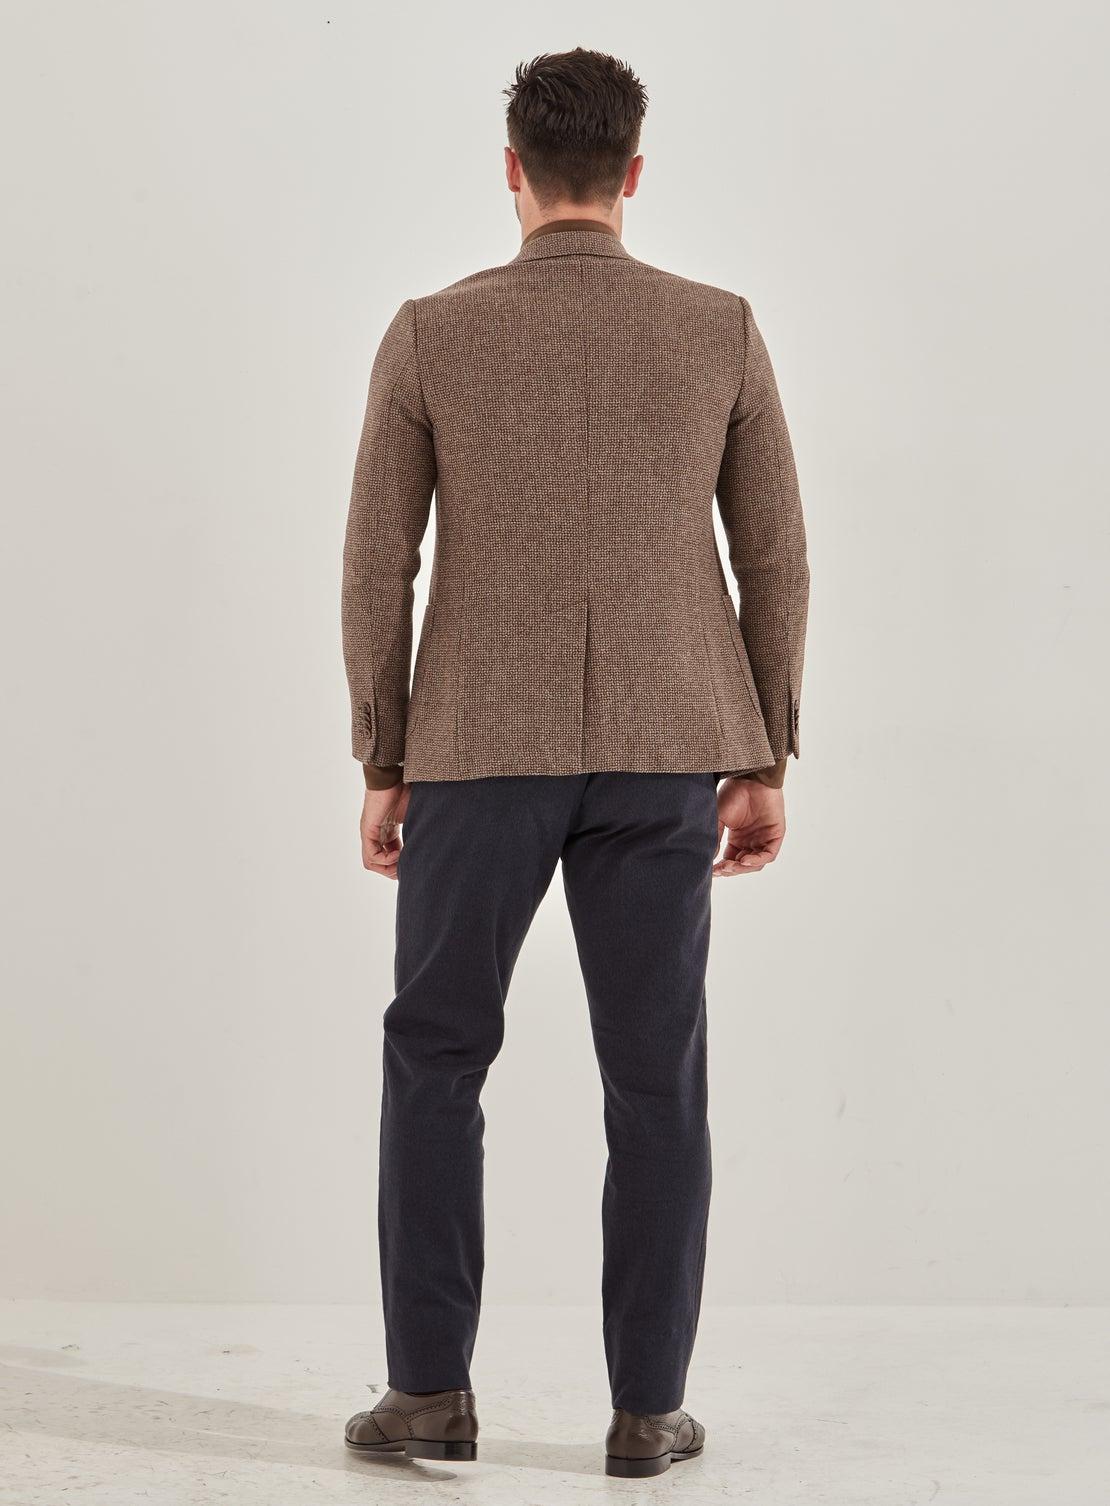 Richie Choc/Camel Basket Weave